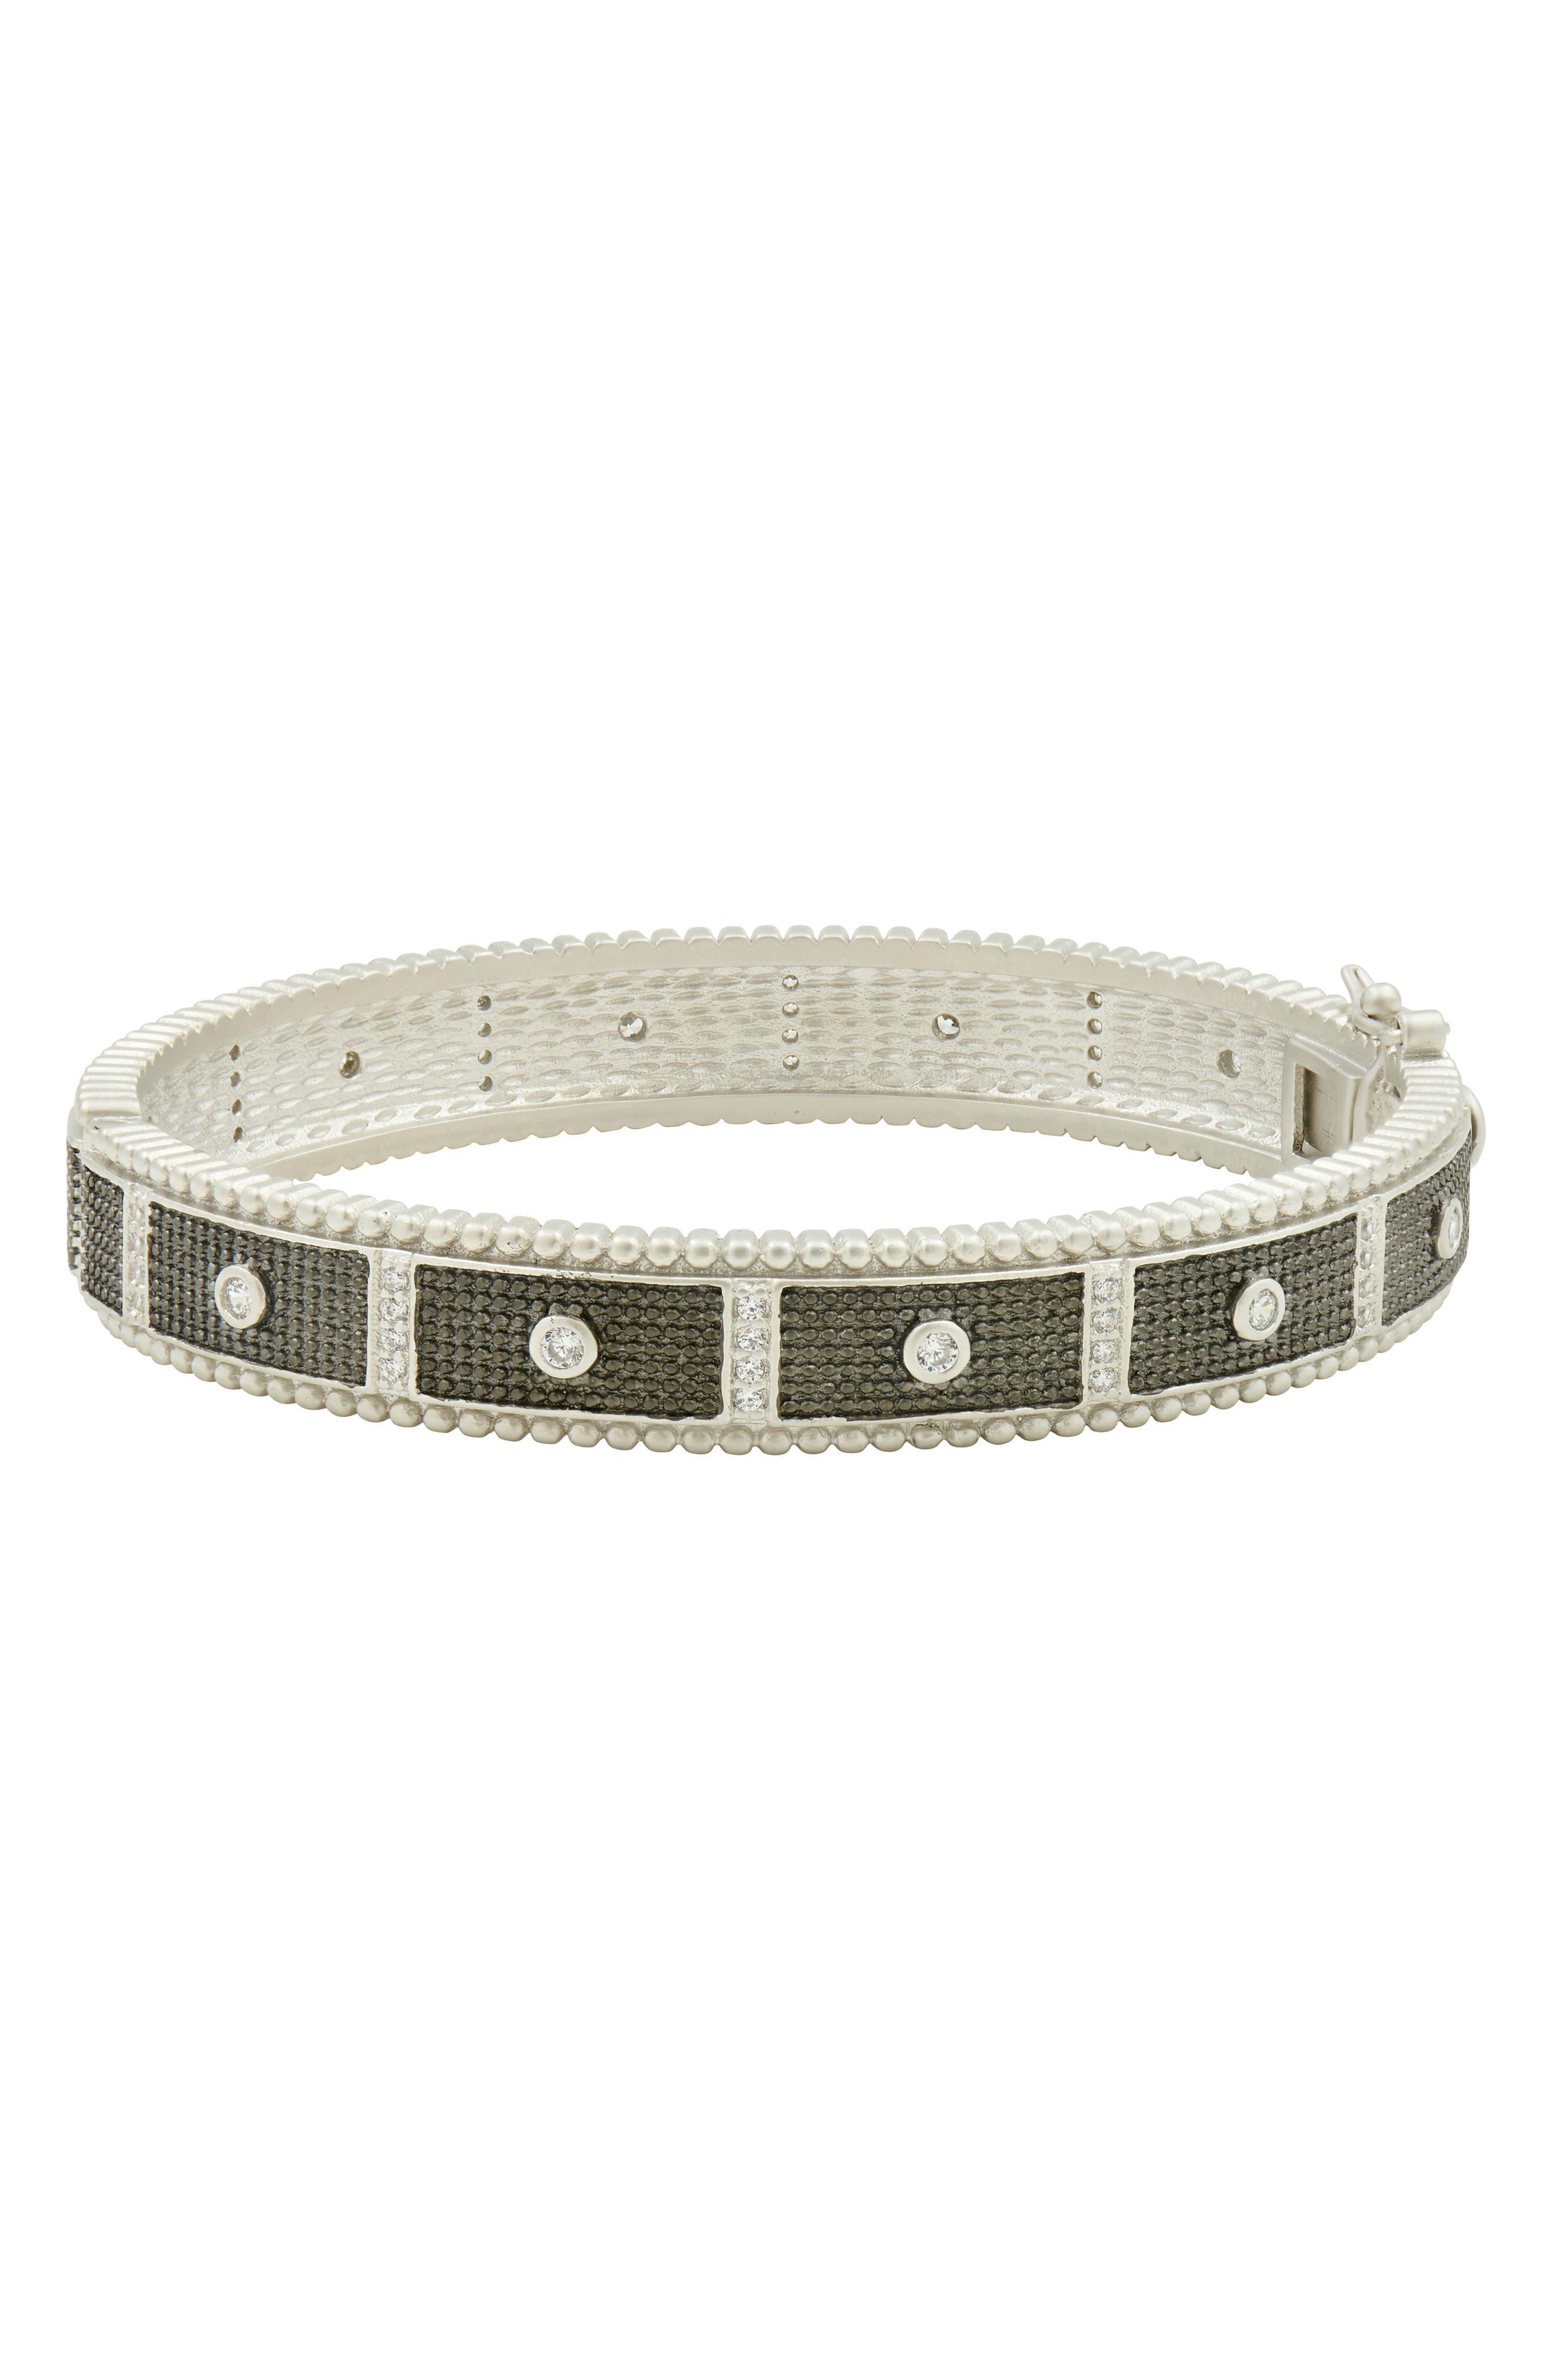 Industrial Finish Bezel Bar Cuff Bracelet,                             Main thumbnail 1, color,                             SILVER/ BLACK RHODIUM